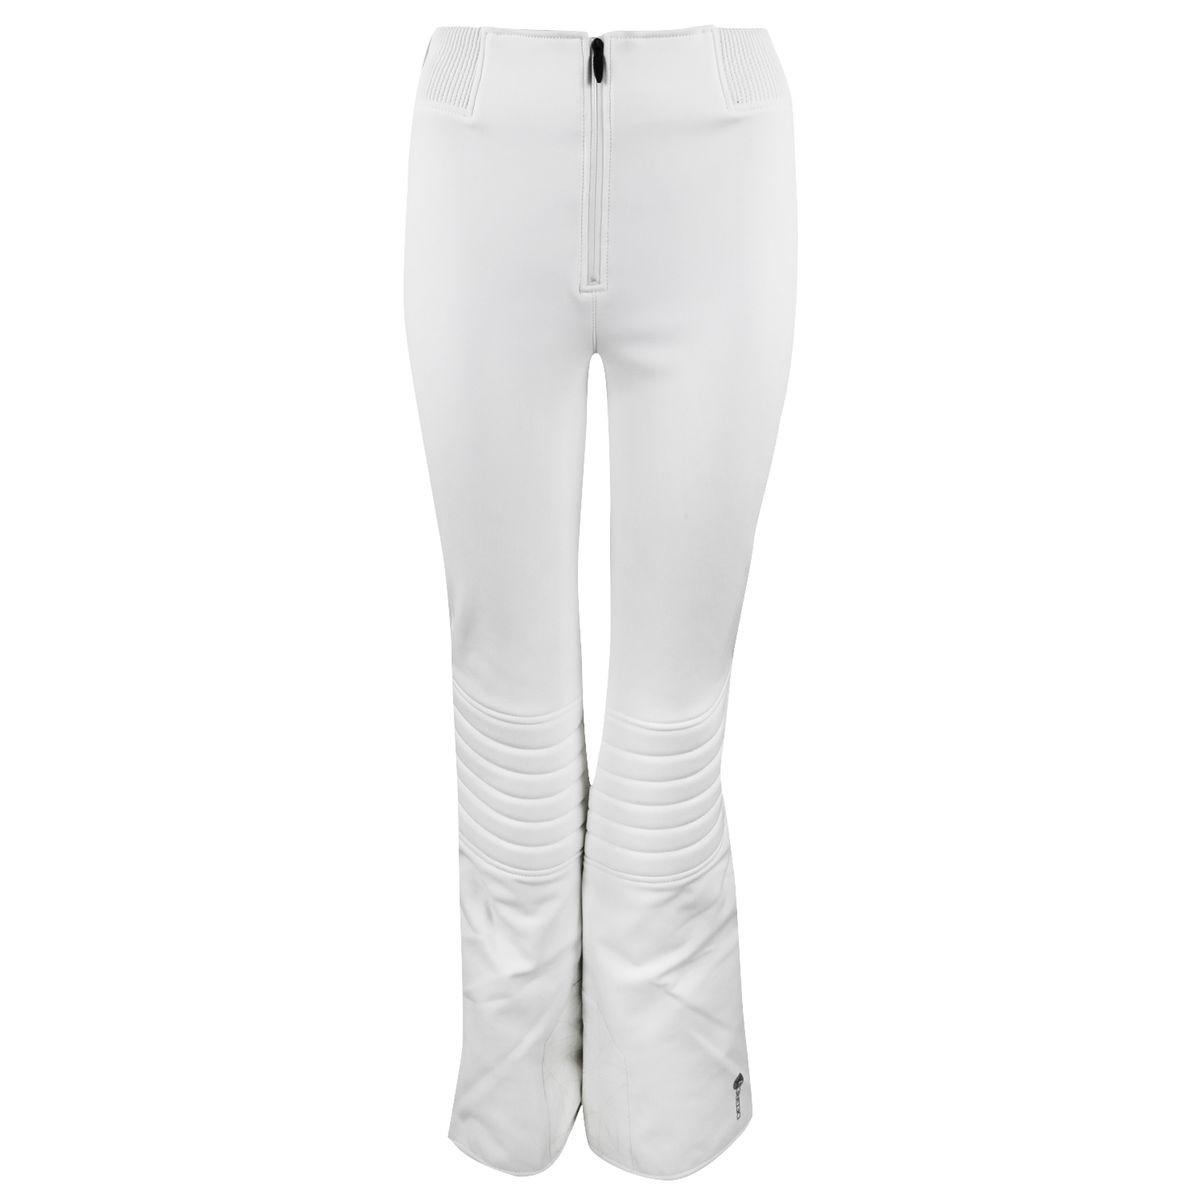 Taille Femme 44 Ski Pantalon Pantalon nOP0kw